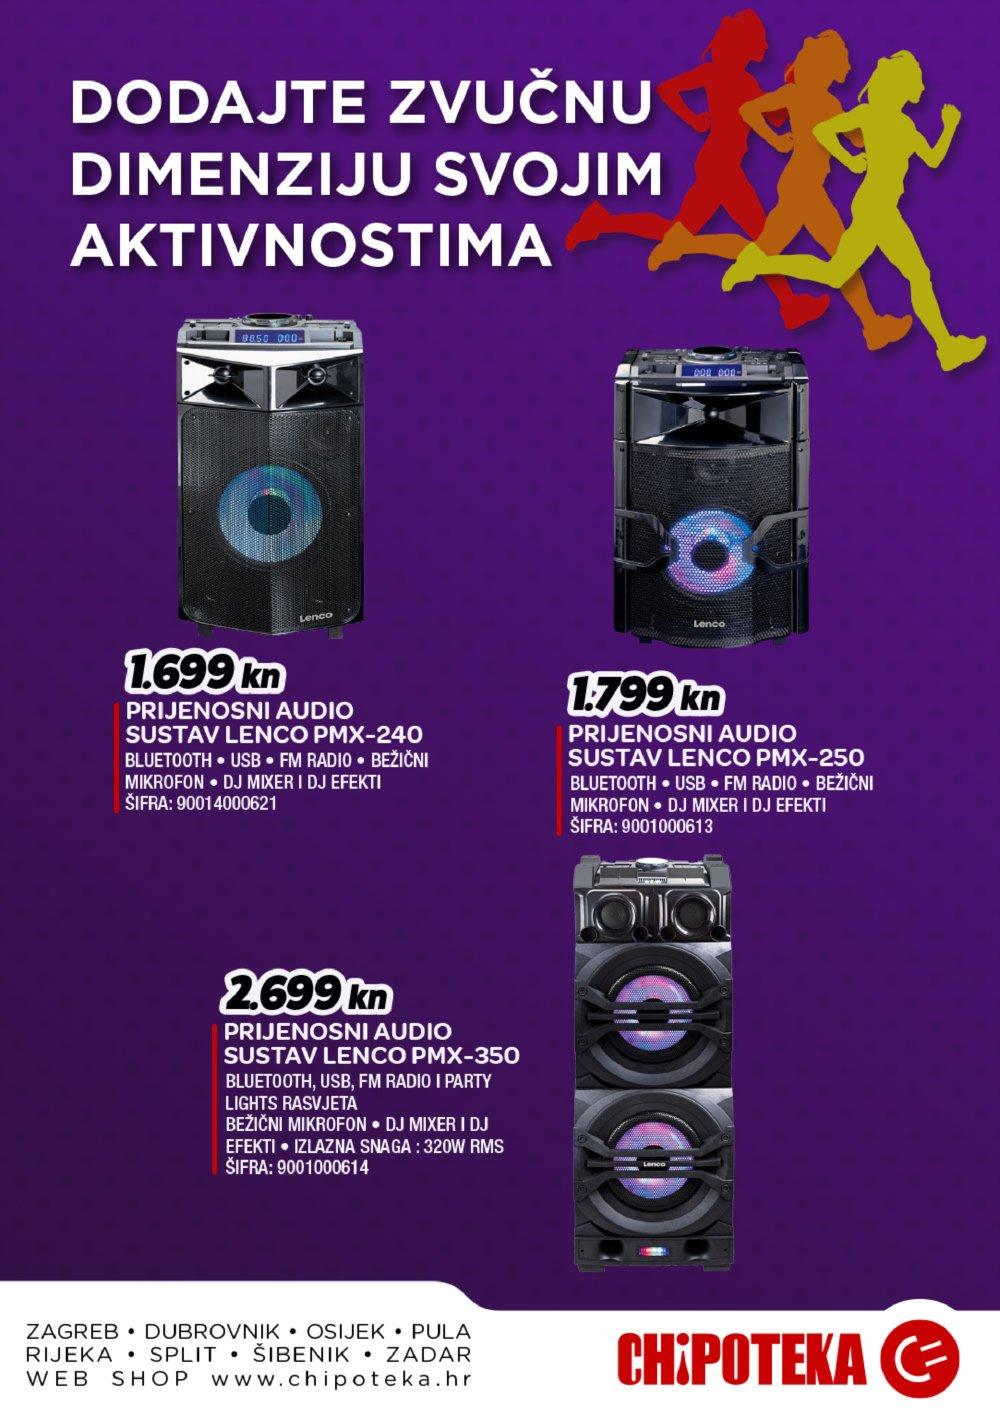 Chipoteka katalog Elektronike 9.10.-9.11.2018.